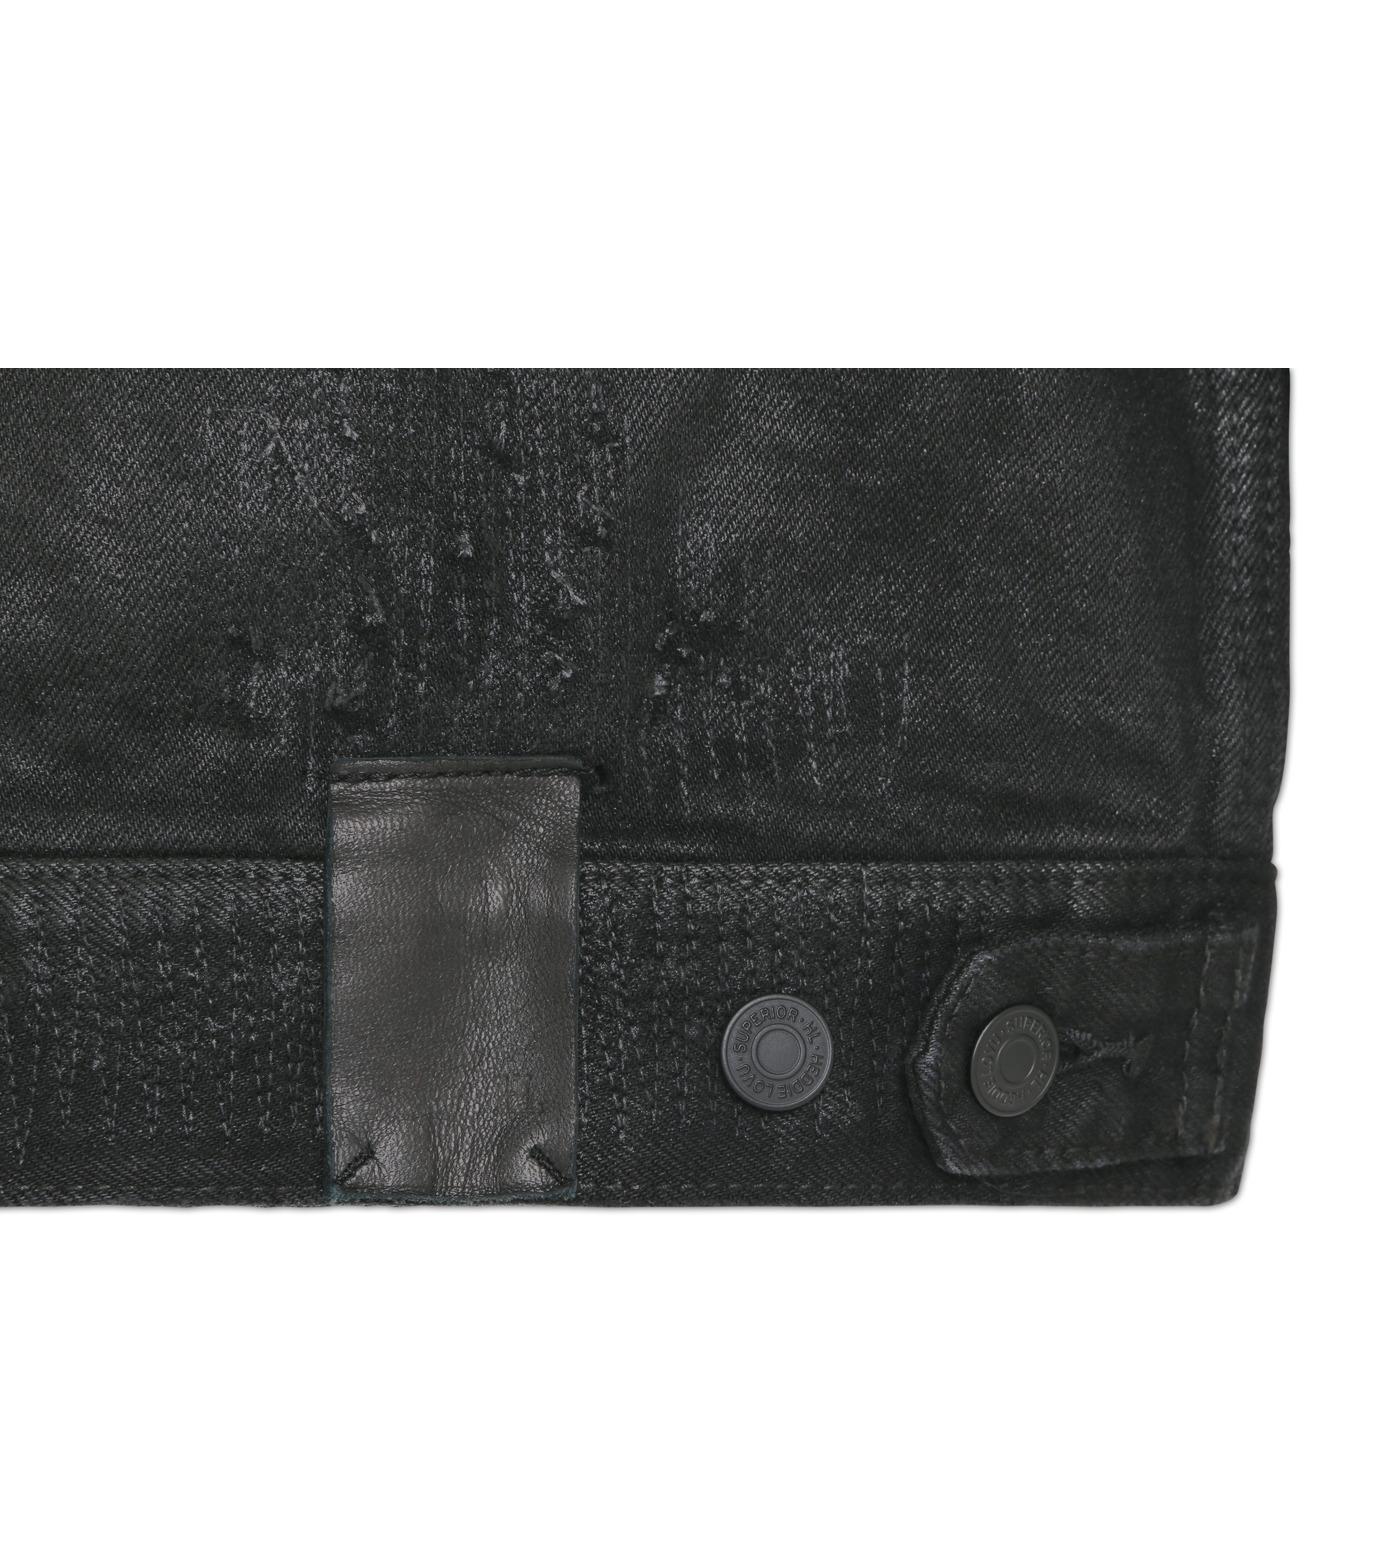 HL HEDDIE LOVU(エイチエル・エディールーヴ)のCOLLARLESS DENIM JACKET-BLACK(ジャケット/jacket)-18S94007-13 拡大詳細画像5